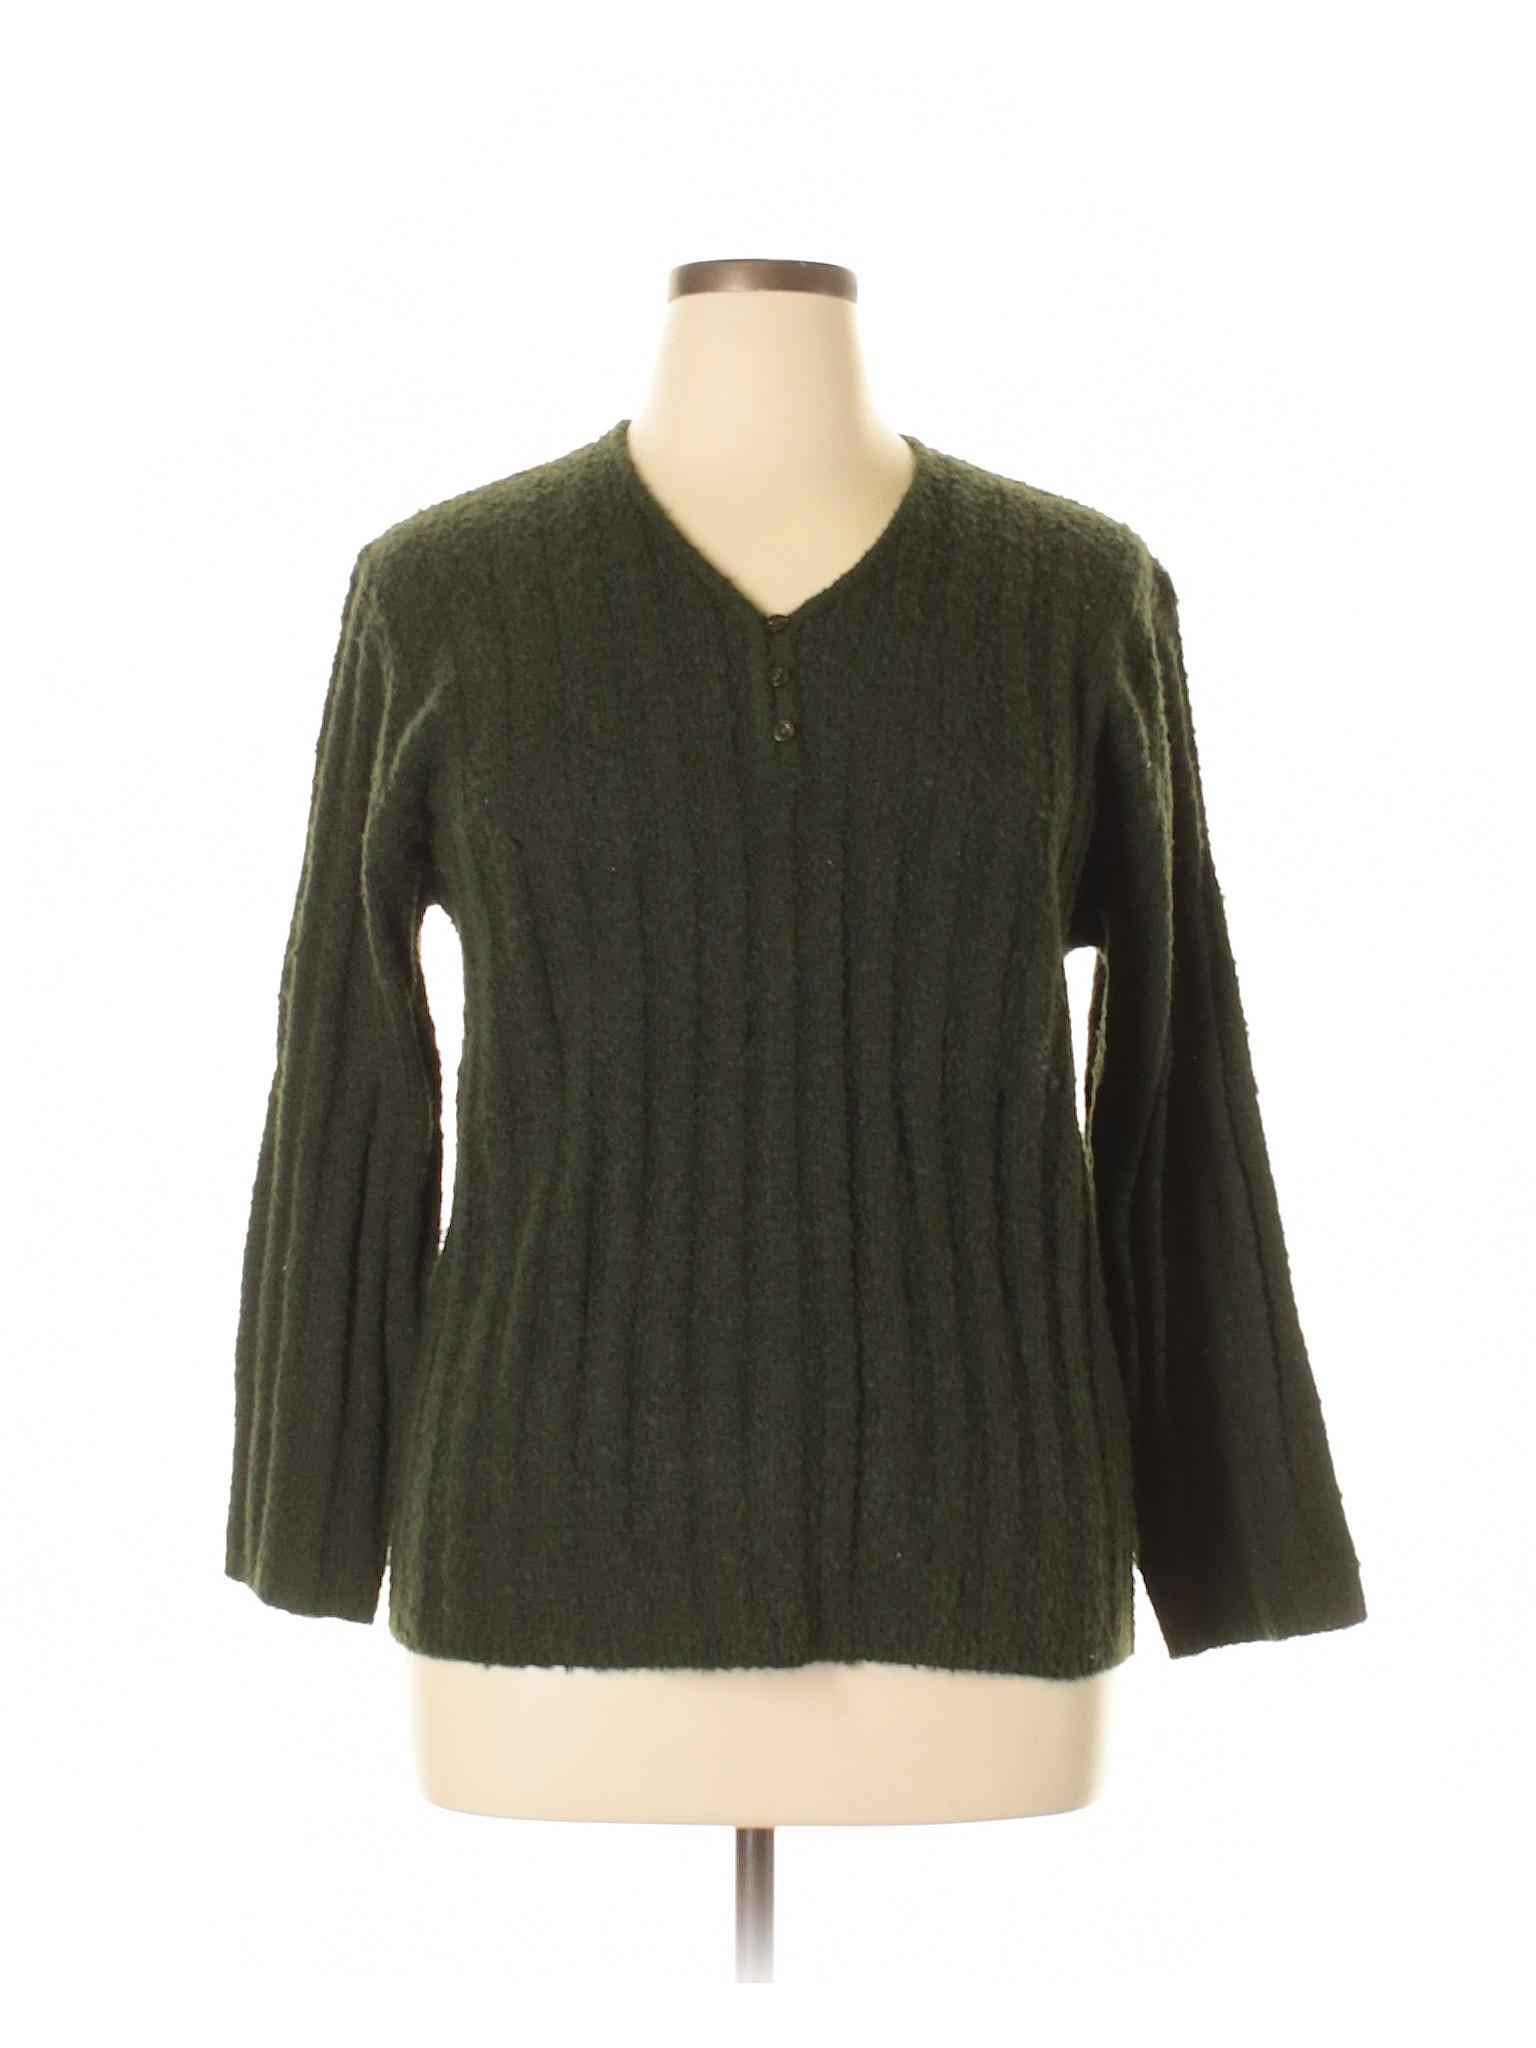 Pullover Stefeno Stefeno Sweater Sweater Sweater Pullover Boutique Sweater Pullover Pullover Stefeno Boutique Boutique Boutique Stefeno Boutique 61gxWZcU